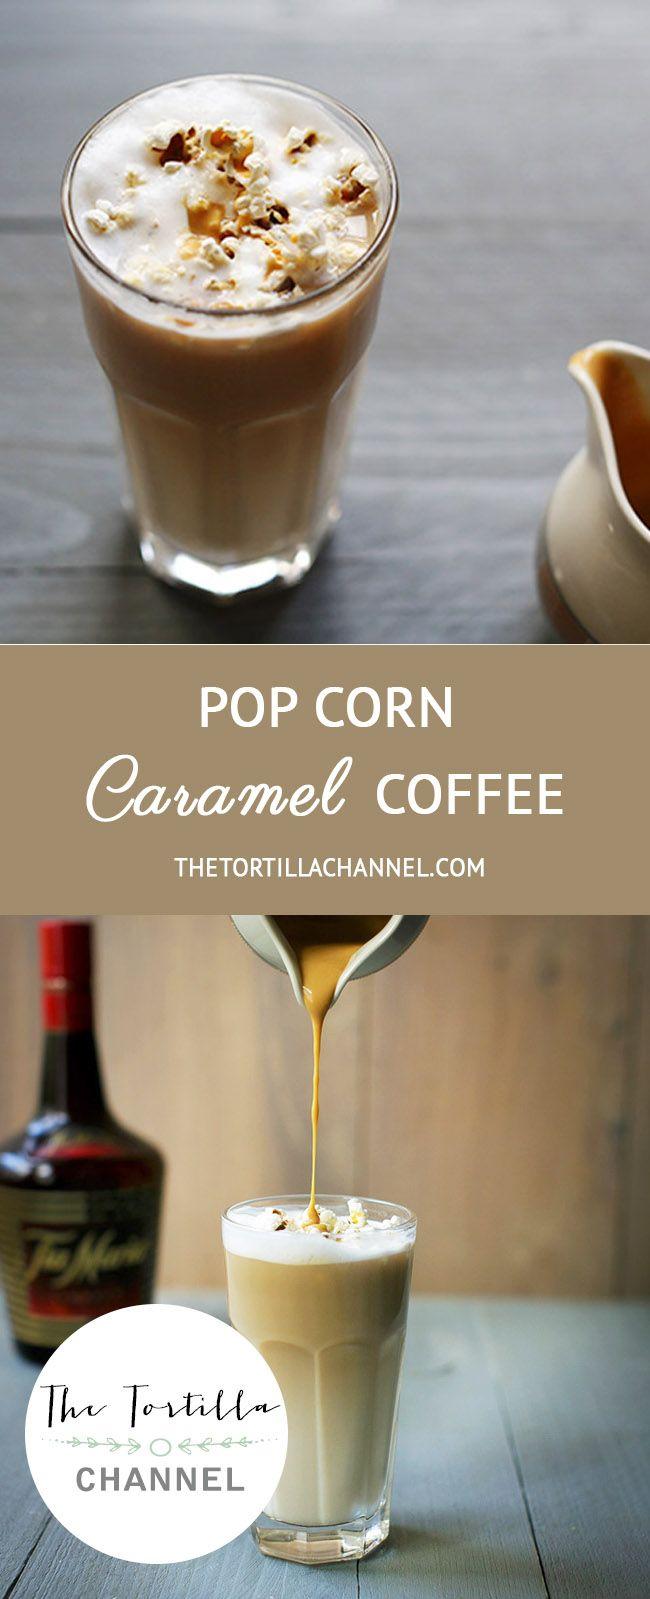 Popcorn Caramel Coffee The Tortilla Channel Recipe Caramel Coffee Coffee Recipe Healthy Coffee Recipes